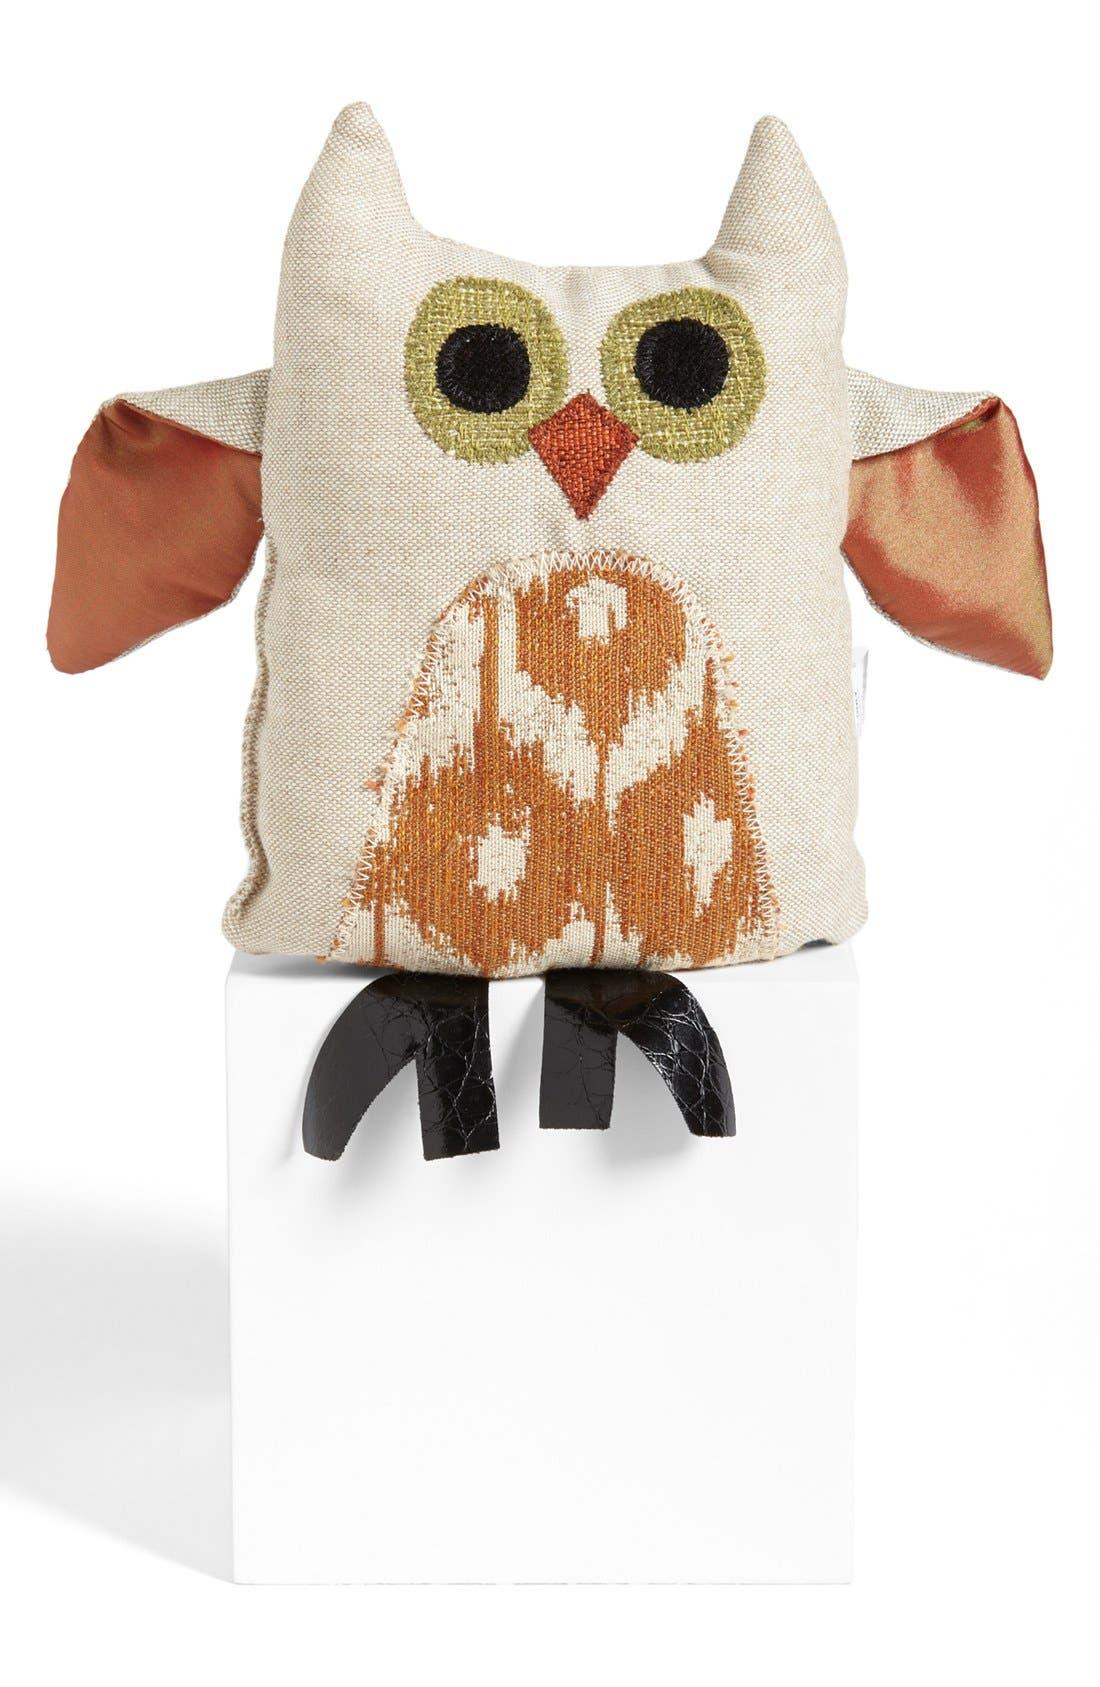 Main Image - Woof & Poof Inc. 'Ambrosia' Owl Bean Bag